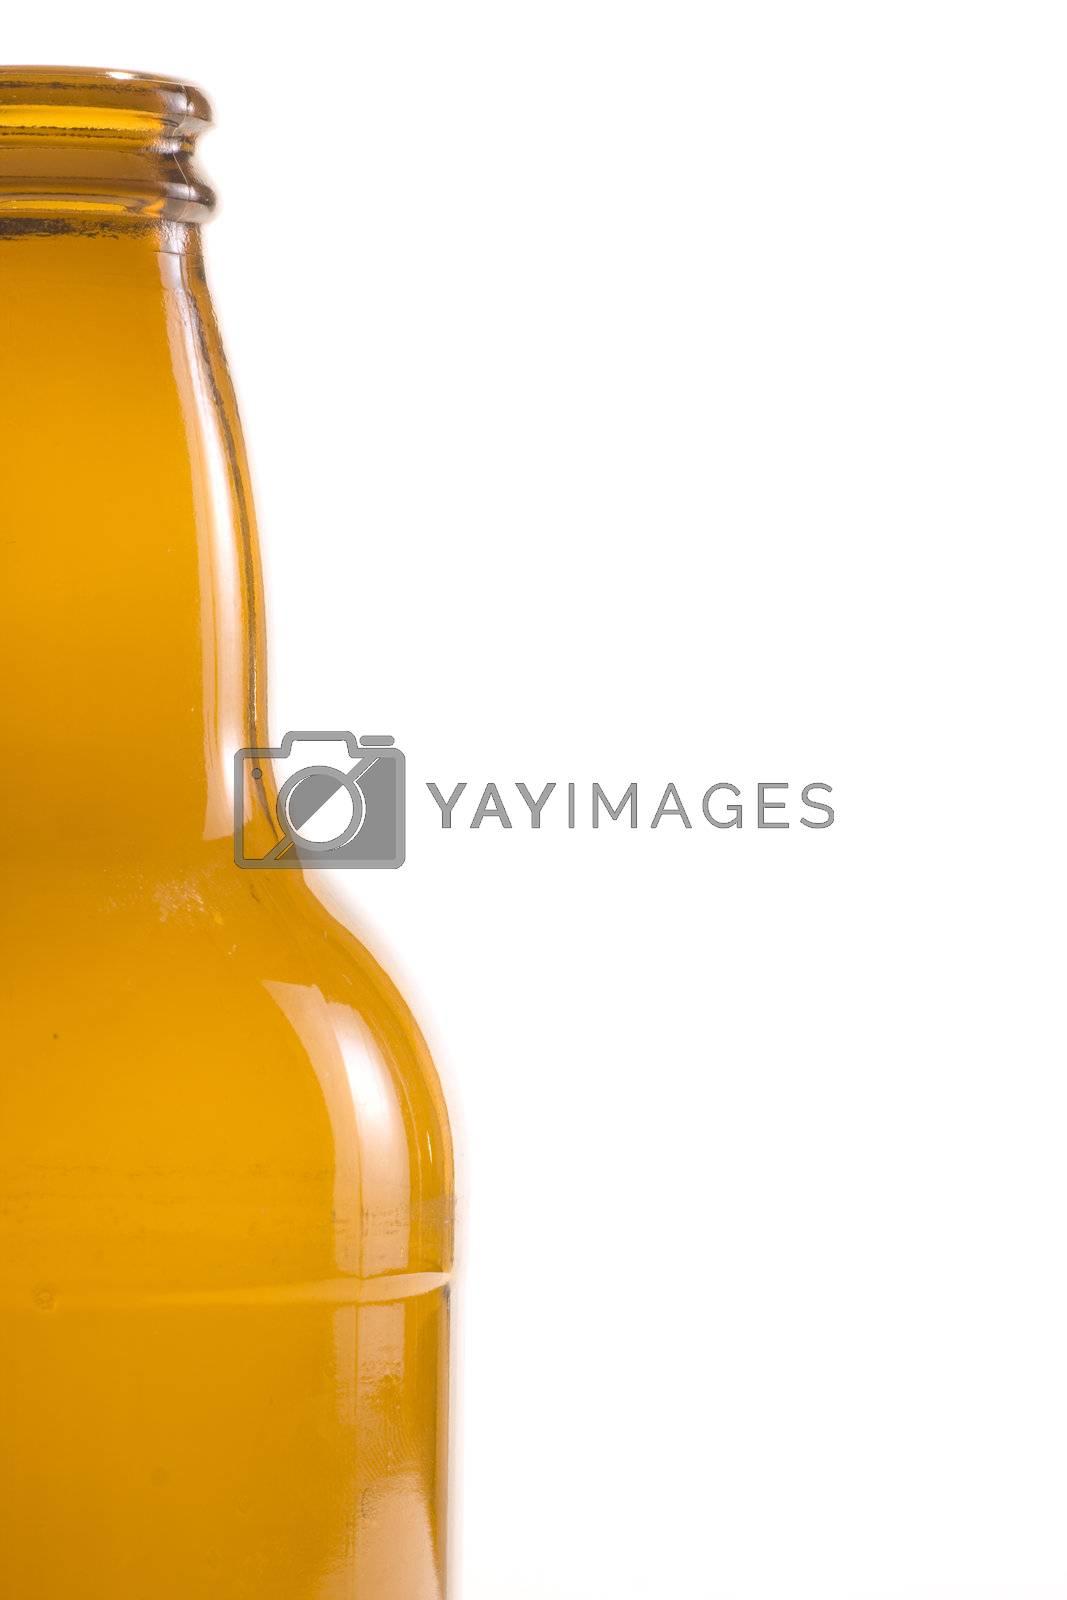 Royalty free image of bottle neck by ctacik